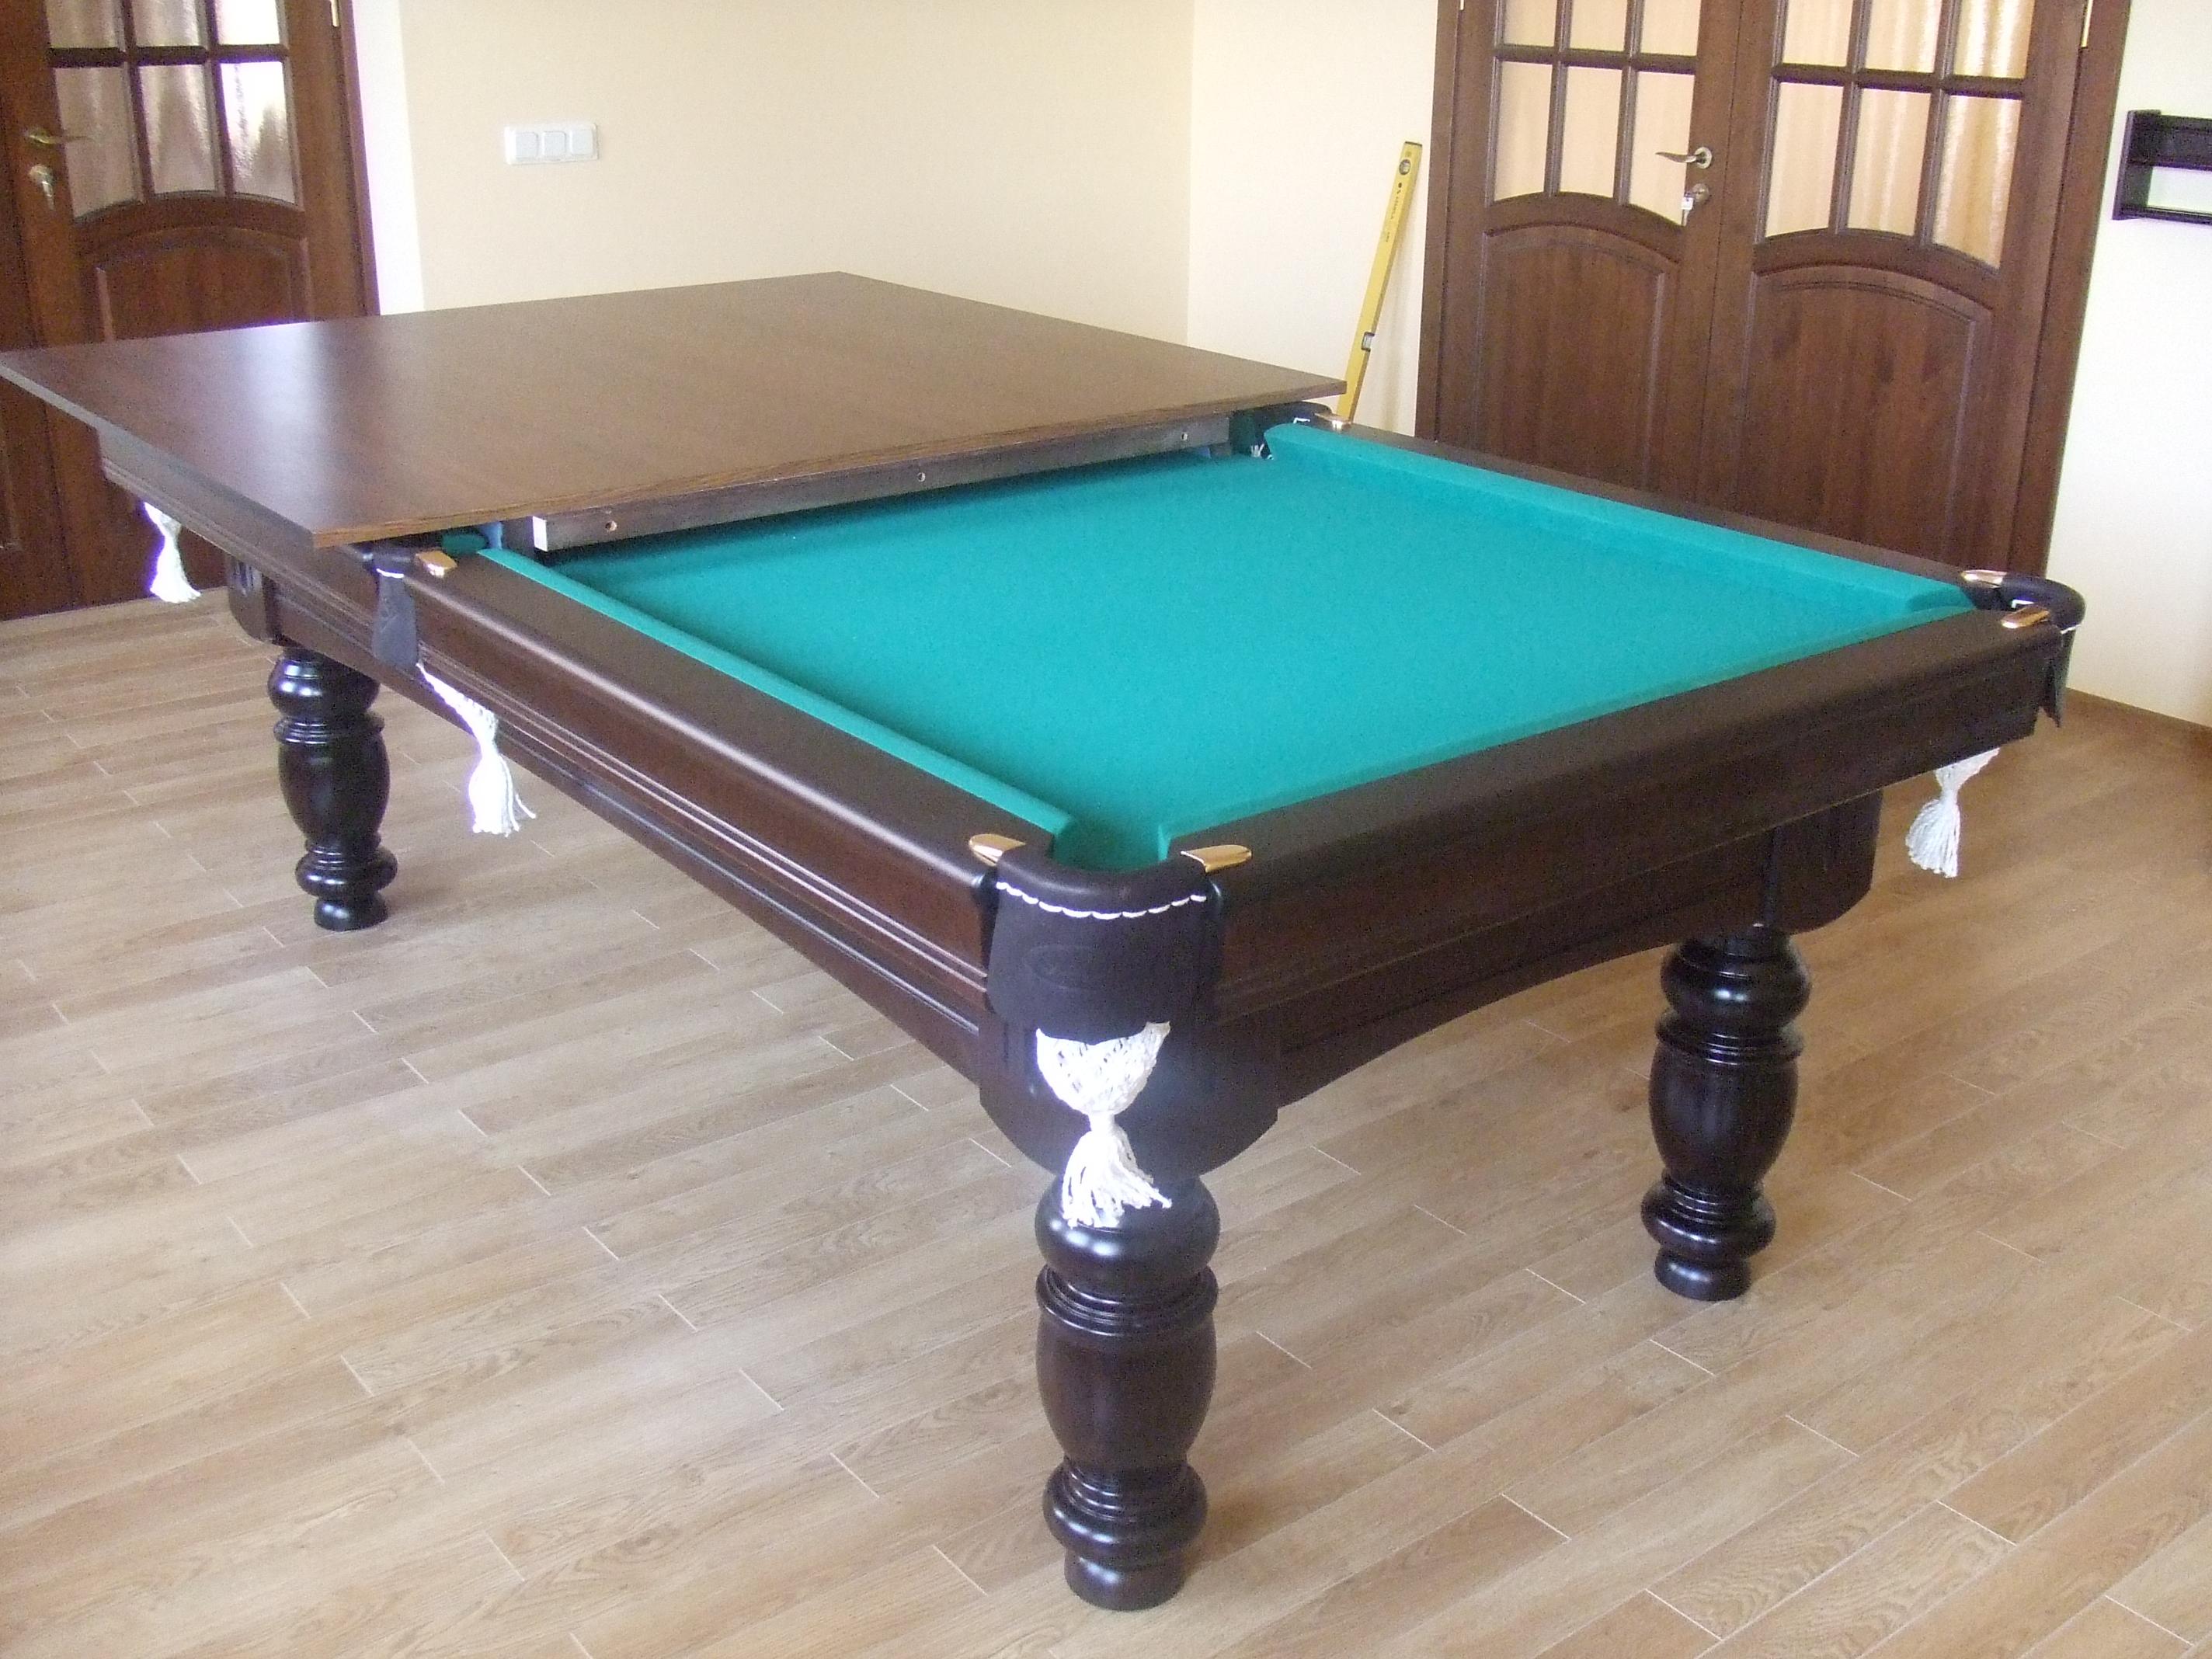 Alex table by Kaldera